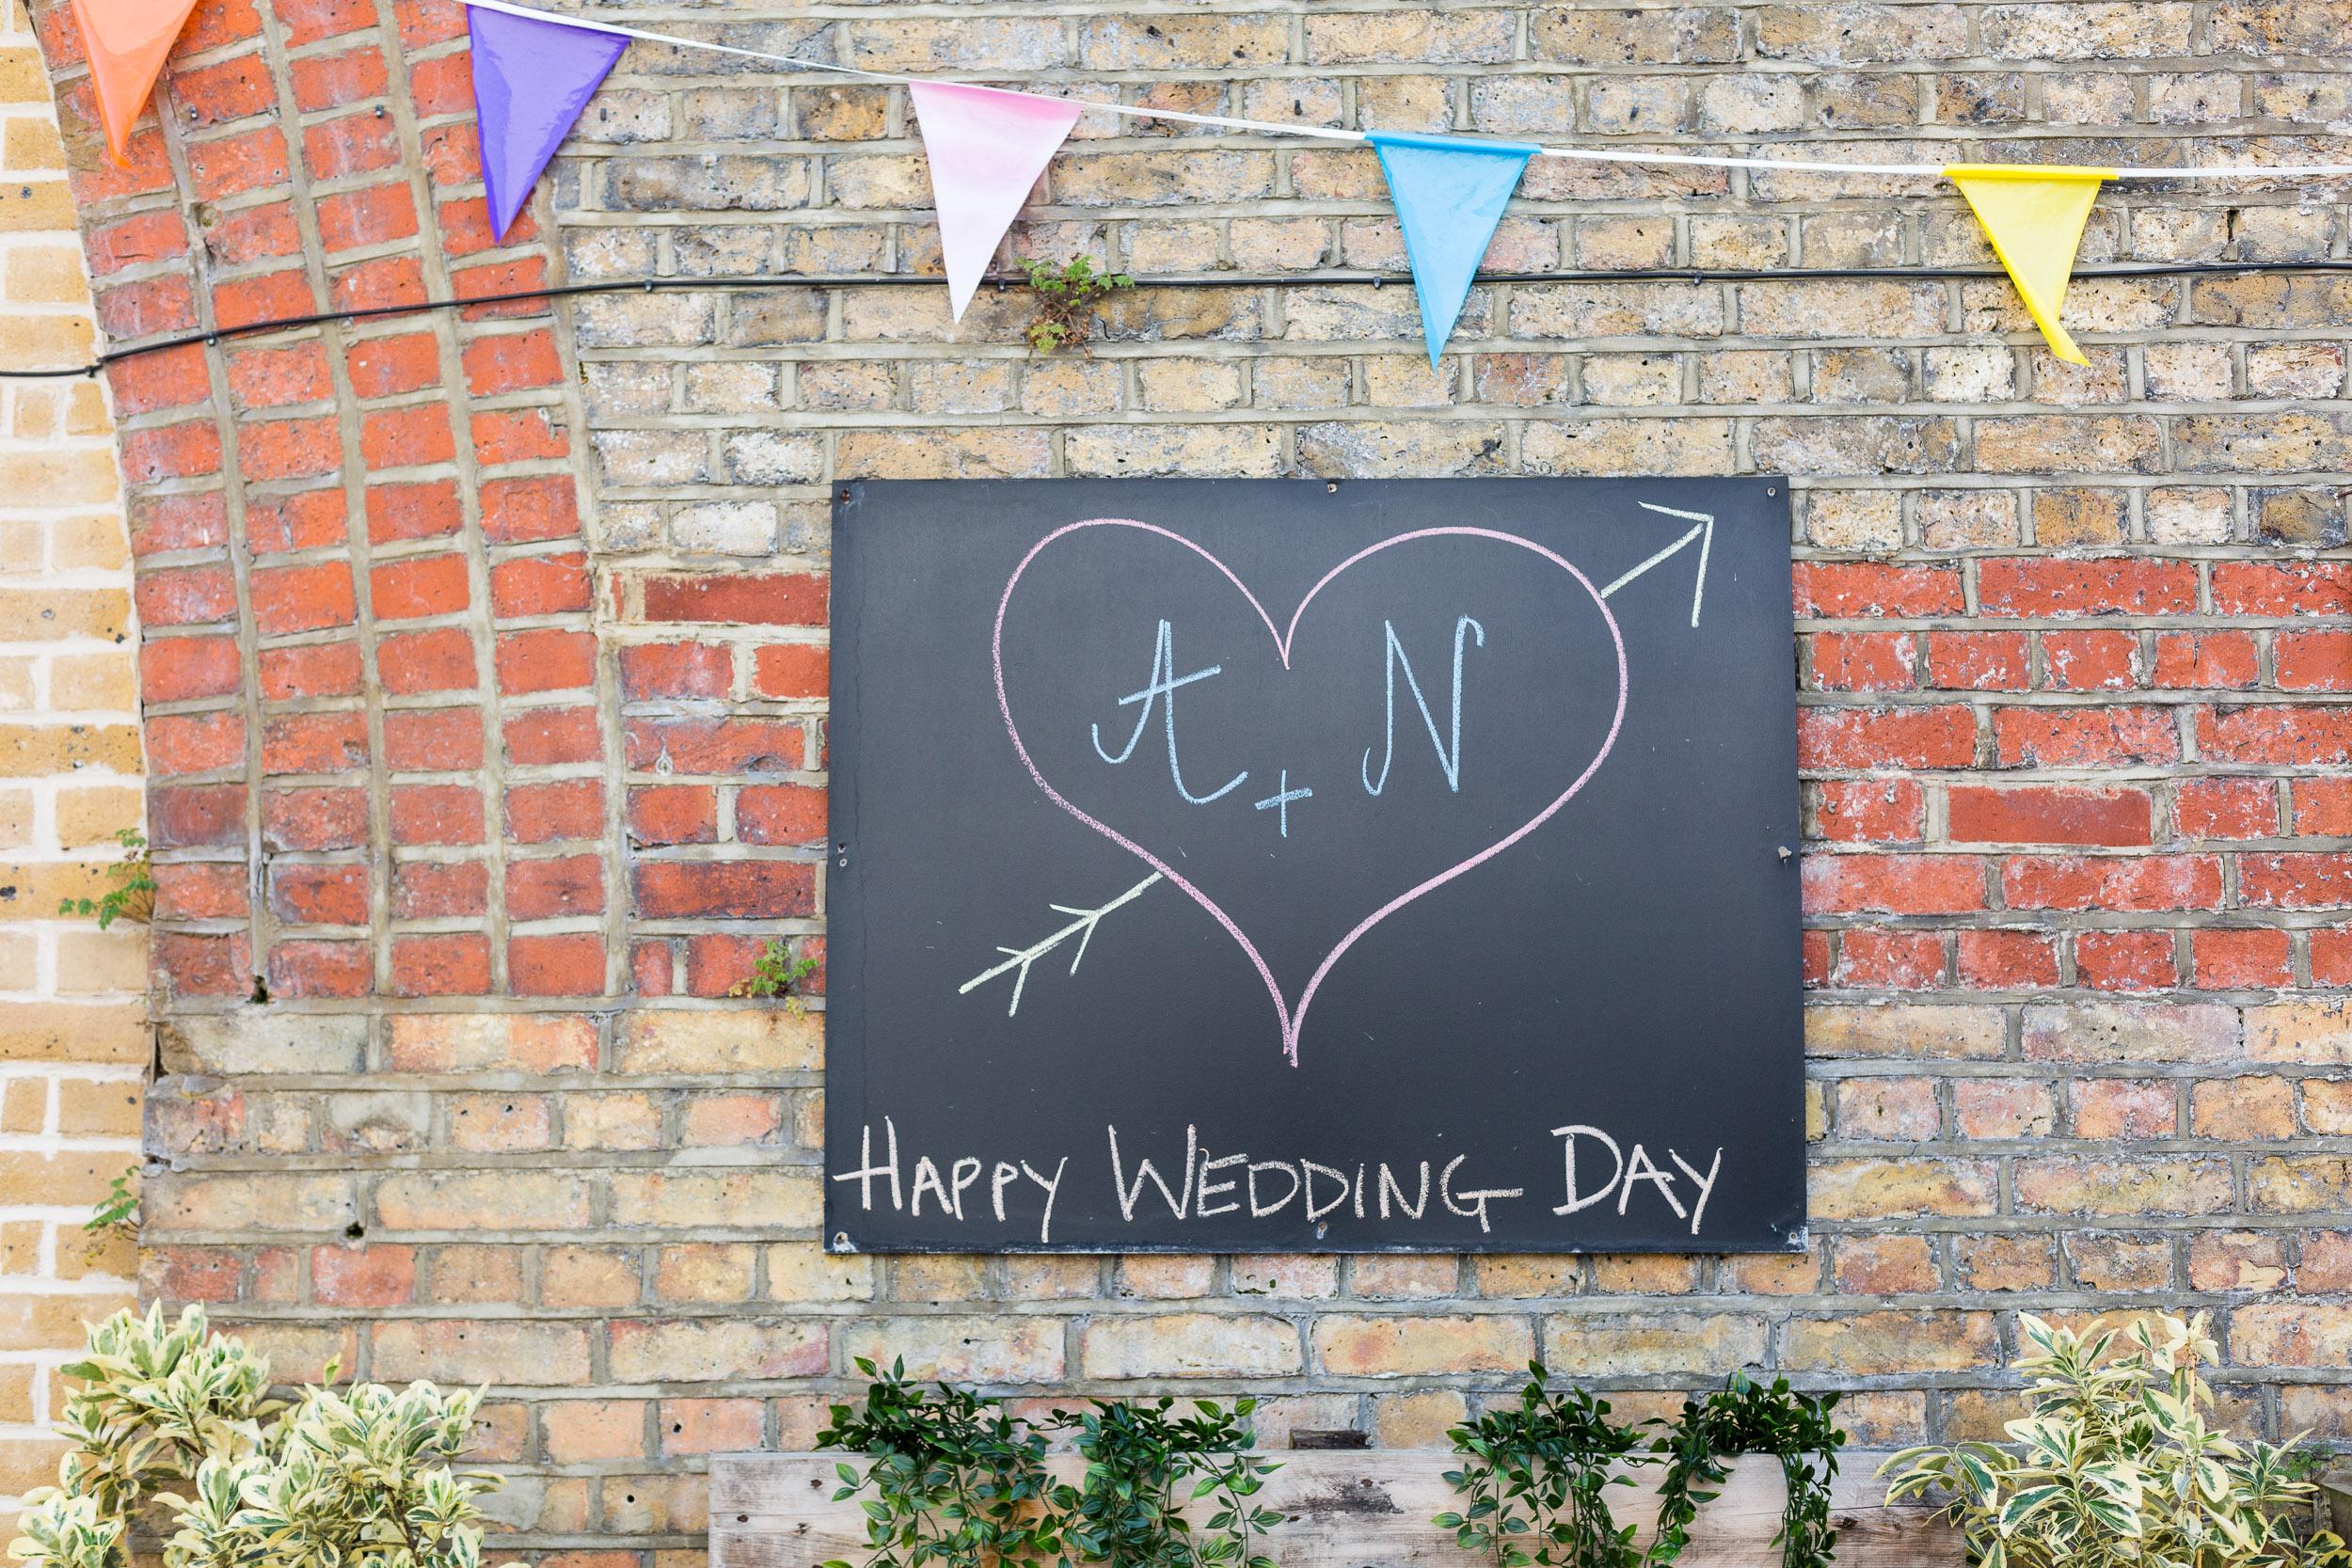 brockwell-lido-brixton-herne-hill-wedding-002.jpg